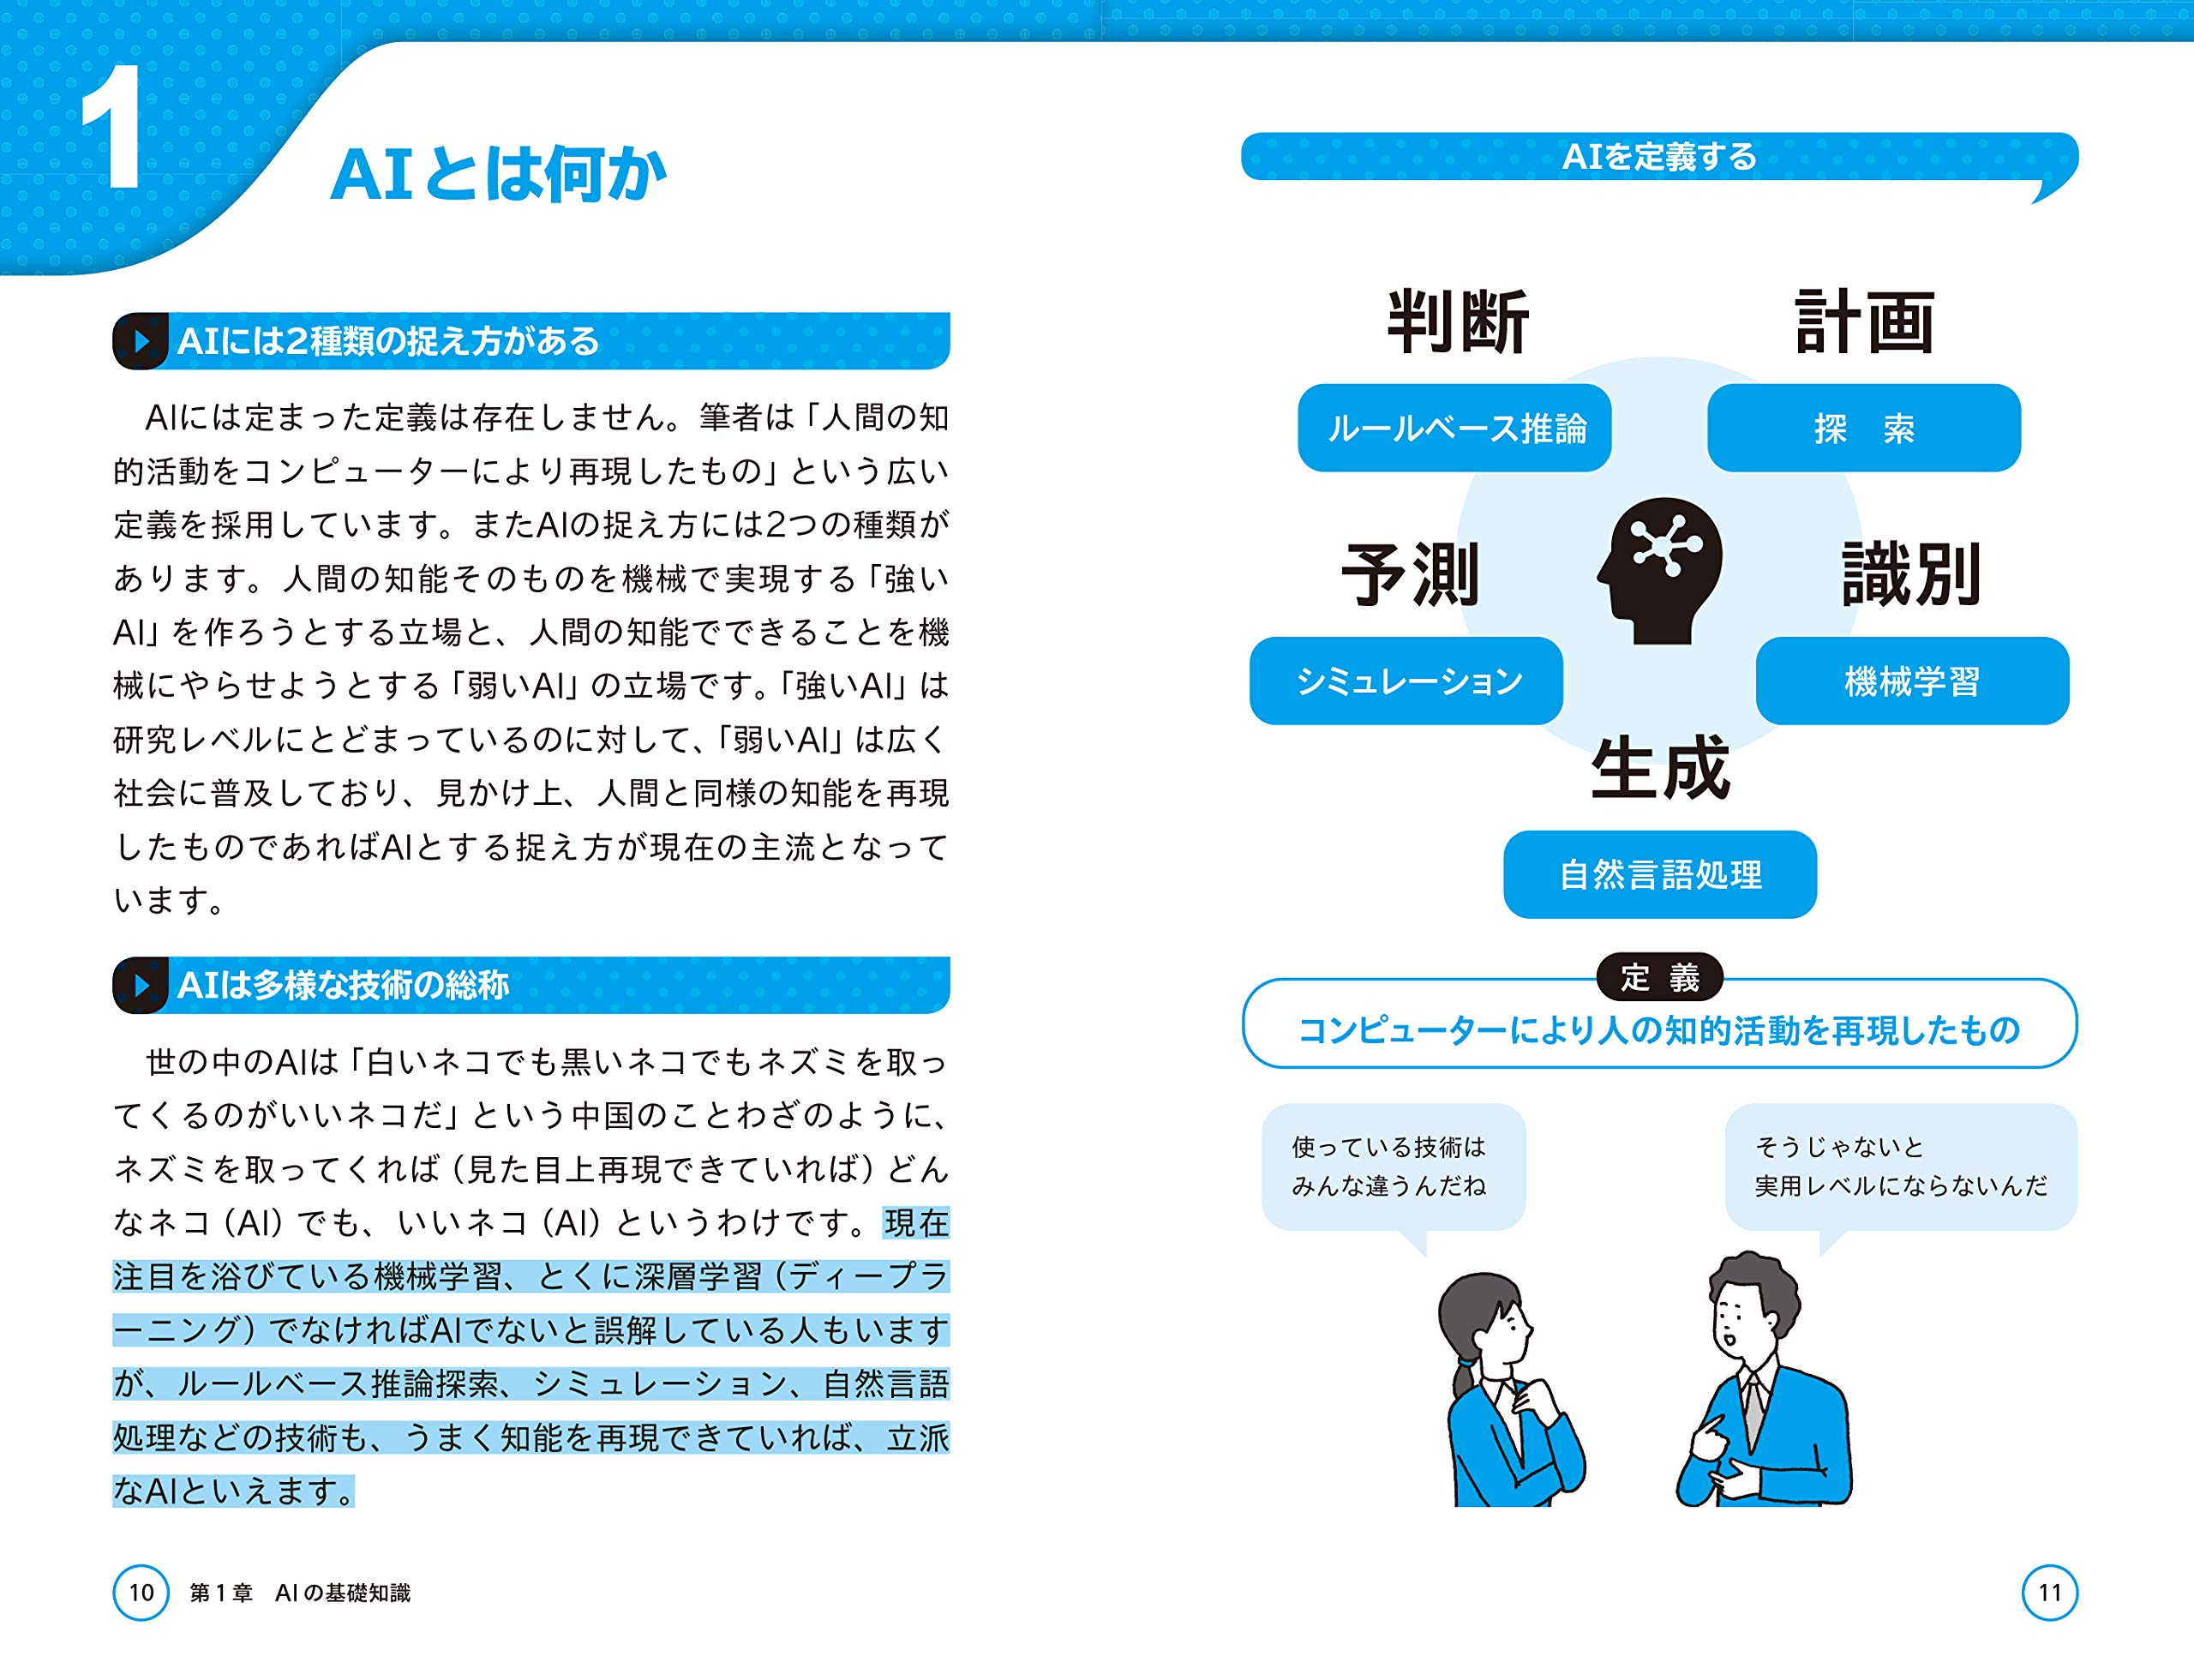 https://images-na.ssl-images-amazon.com/images/I/81M-JsWVquL.jpg